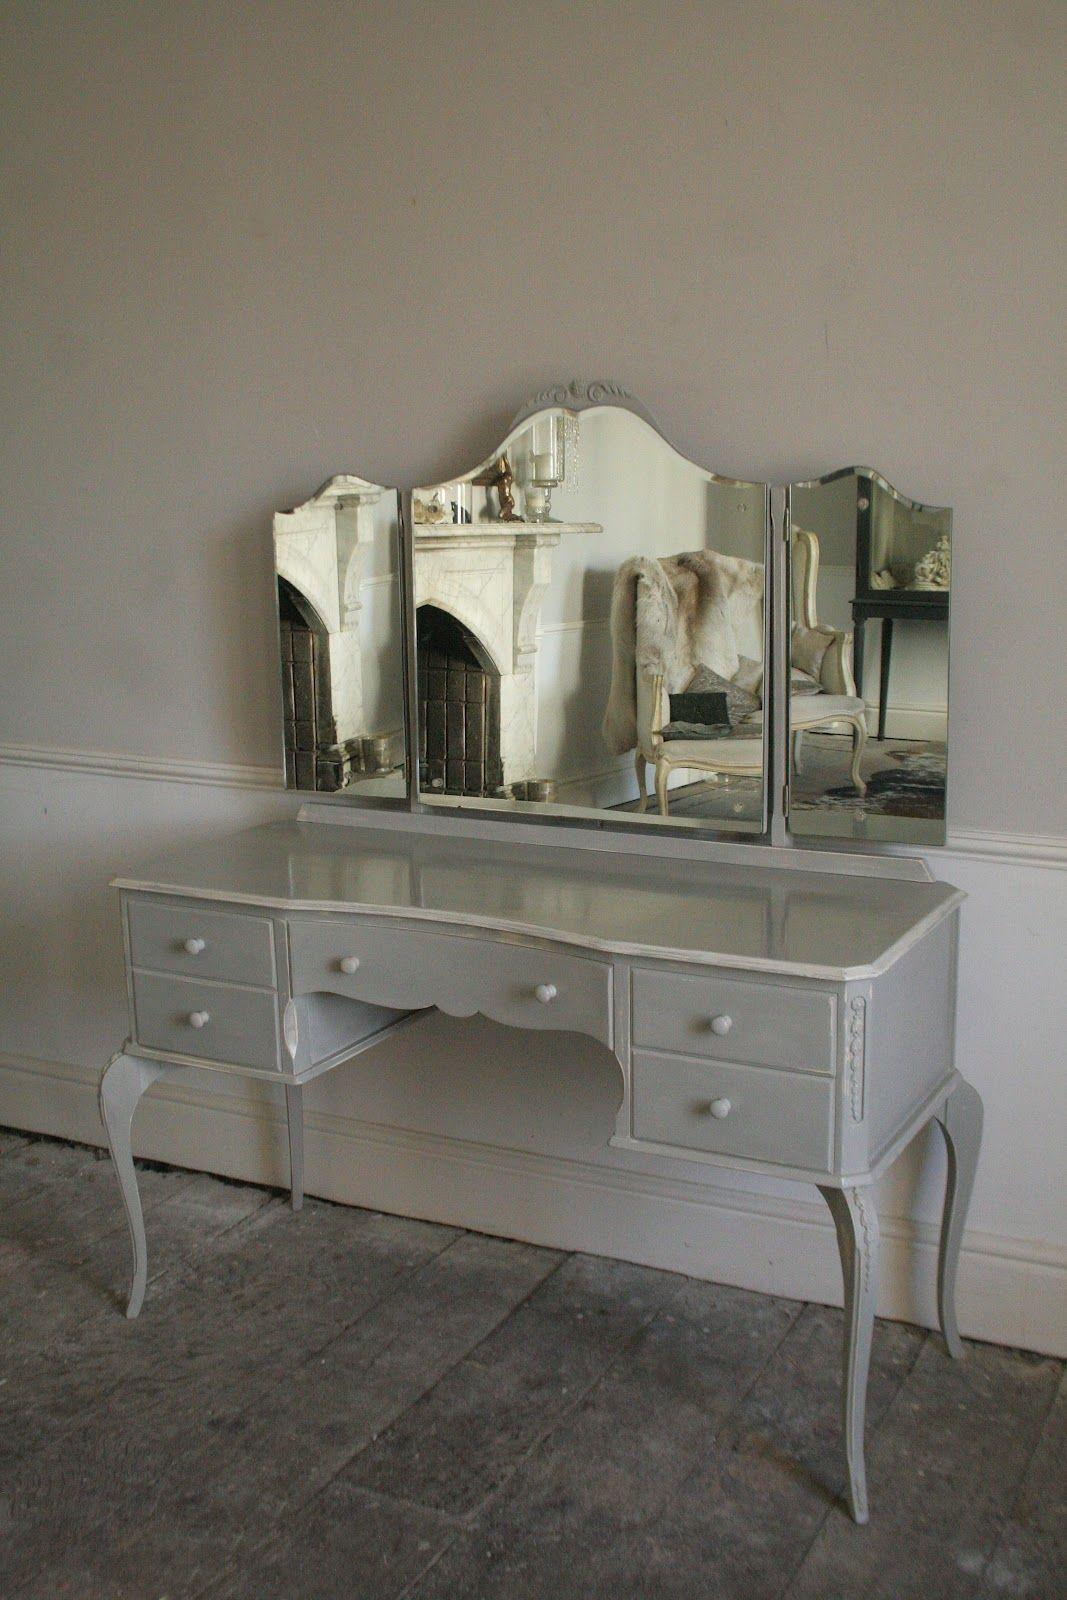 Glamorous Vintage Dressing Tablei Really Need To Do Some Estate